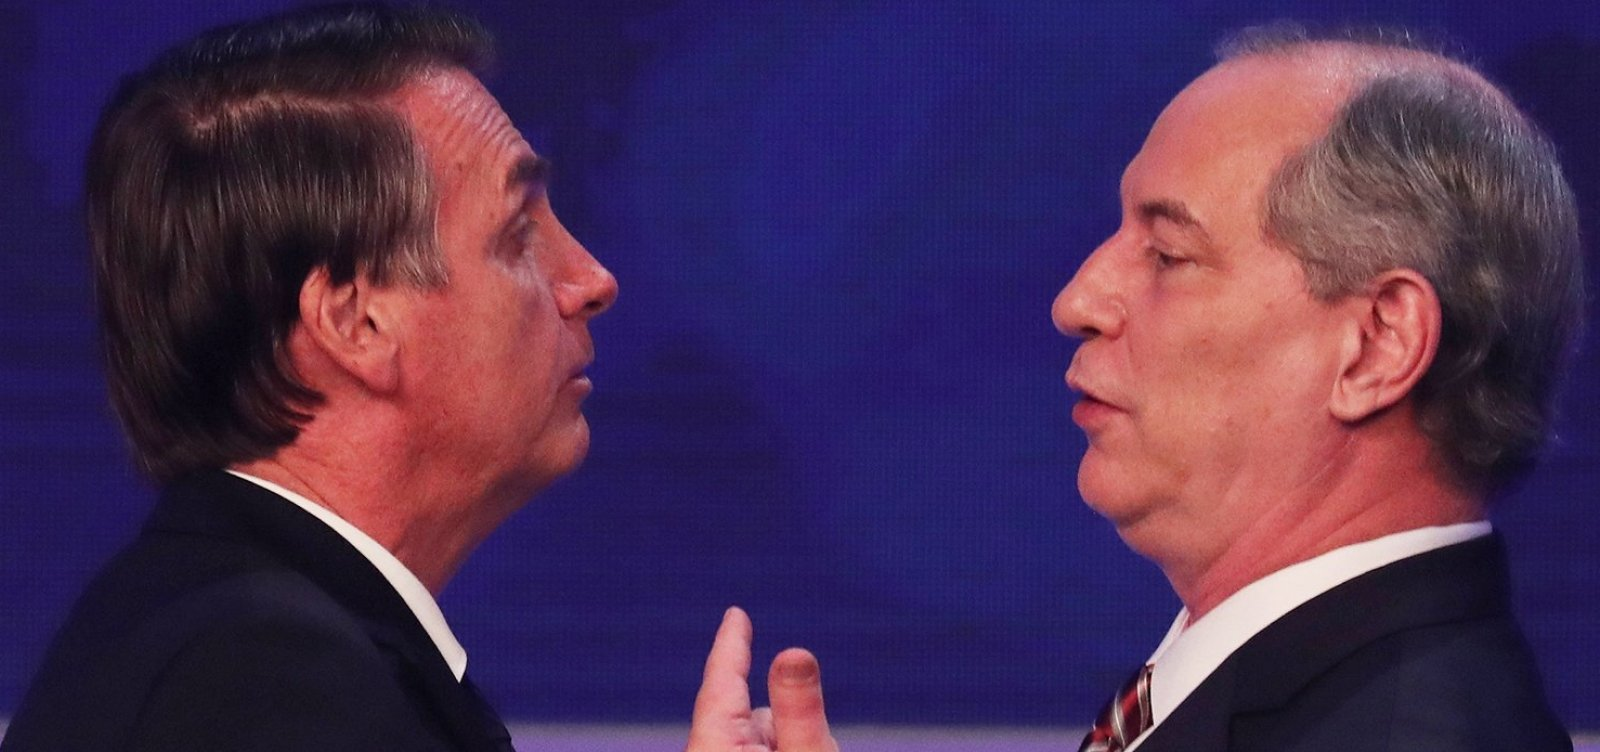 [Após ser processado por Bolsonaro, Ciro Gomes debocha: 'Justiça será feita']